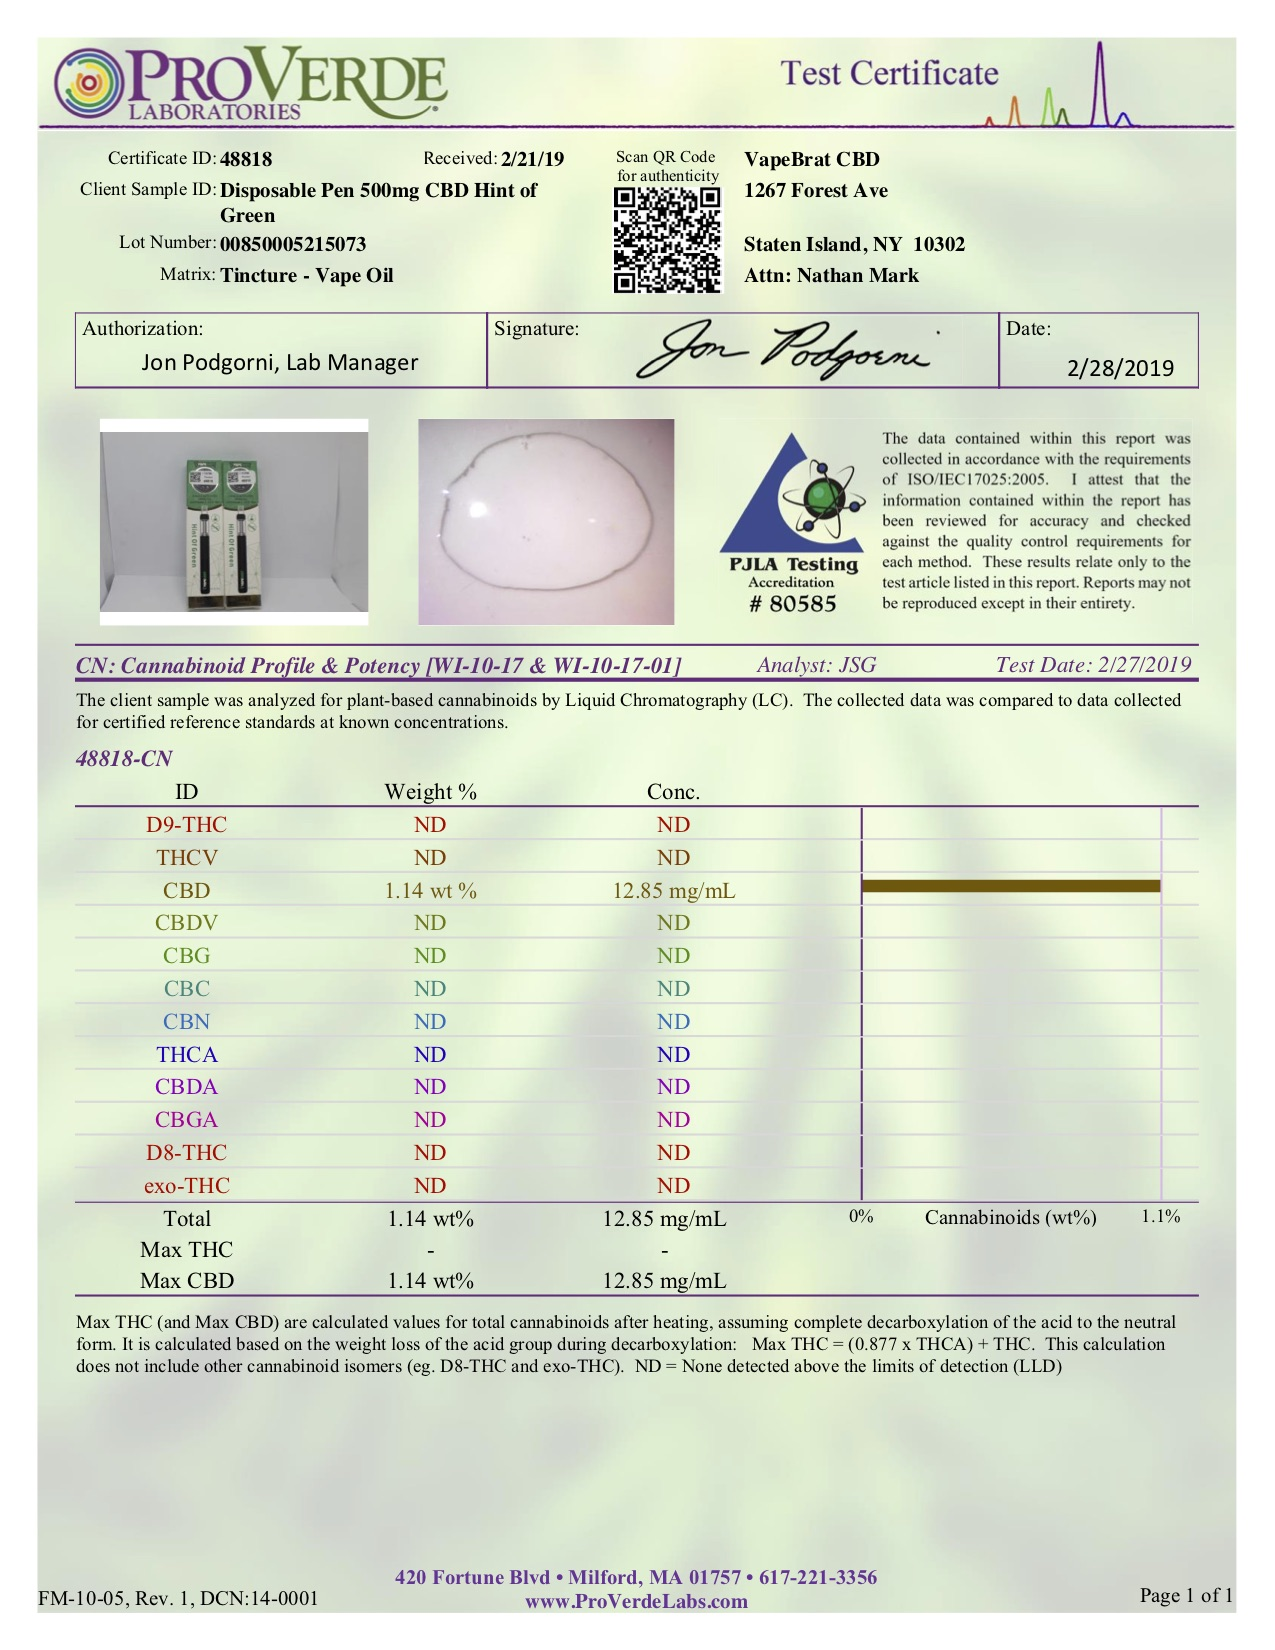 48818-cn-disposable-pen-500mg-cbd-hint-of-green.jpg